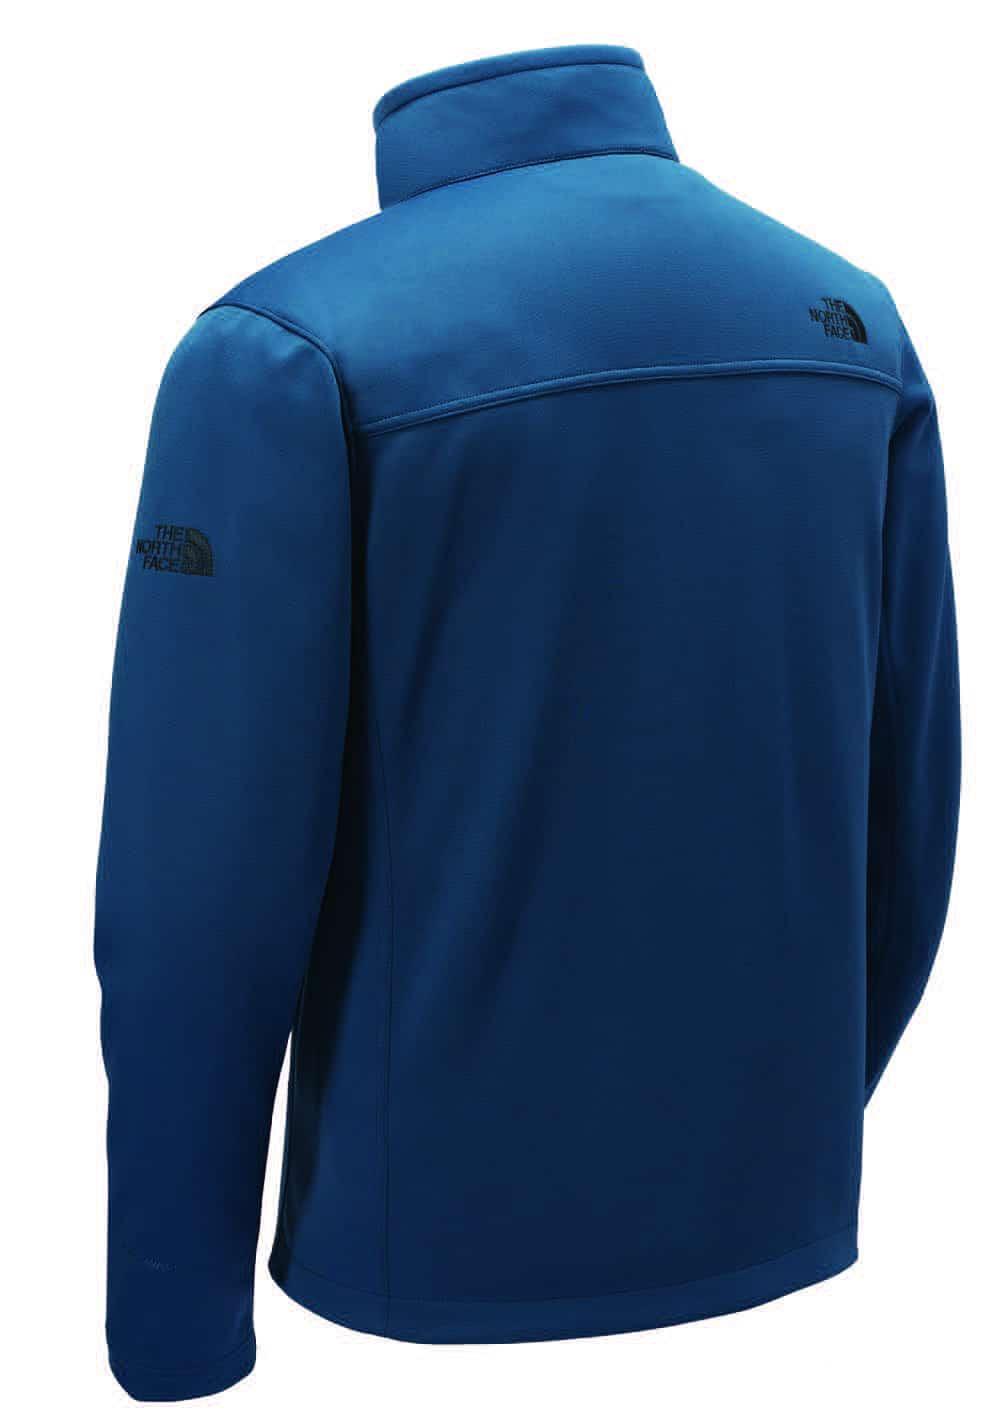 Custom North Face Jackets – Ridgeline